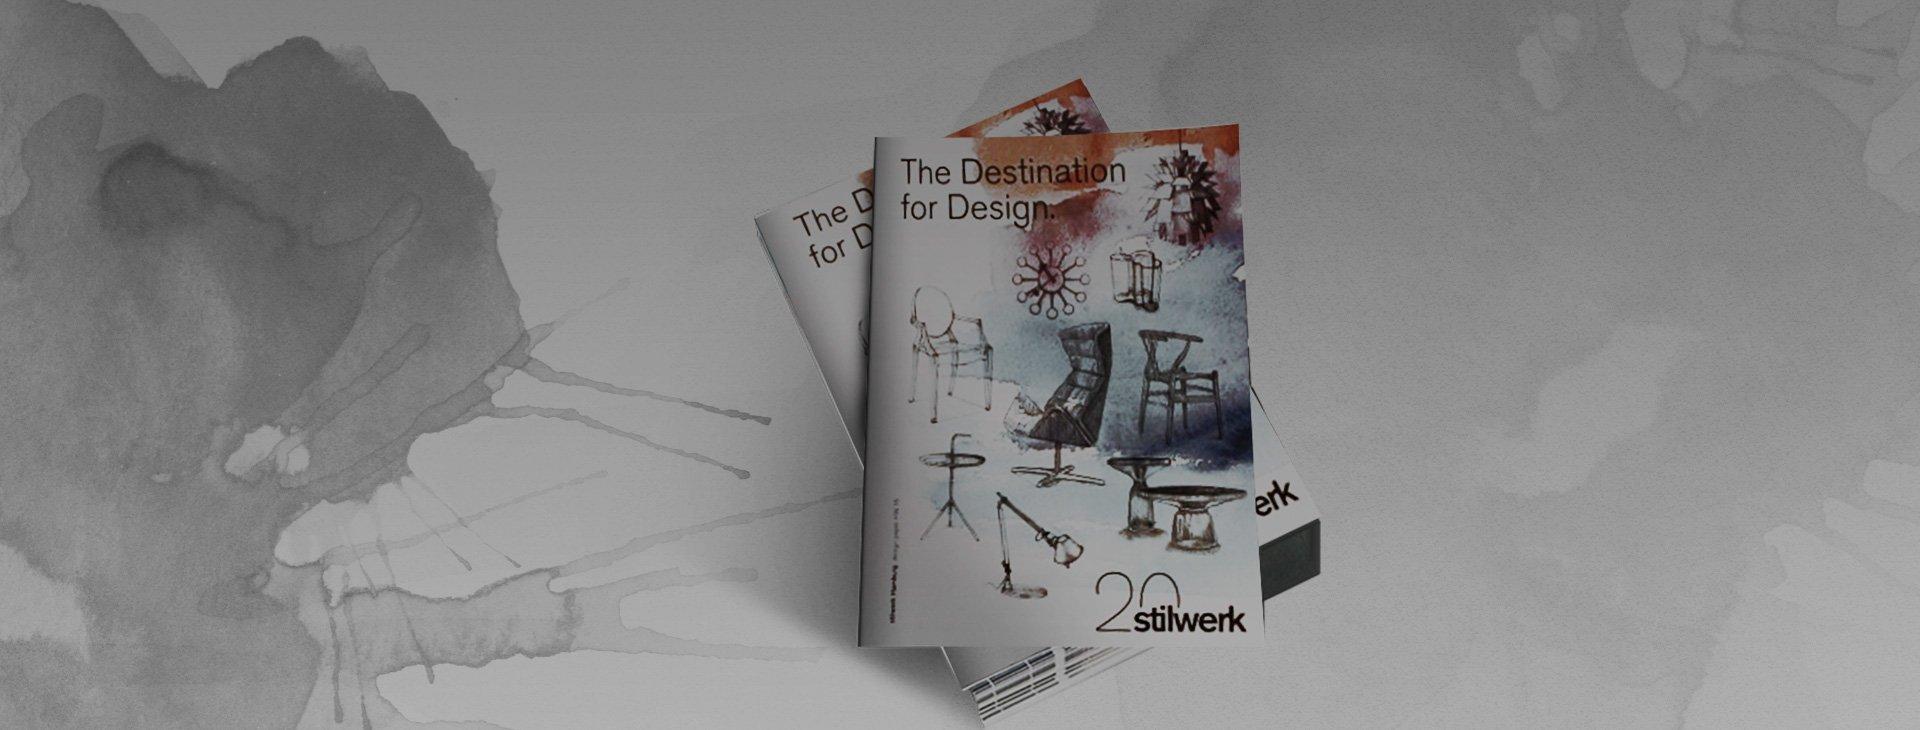 stilwerk_designpaper_2016_stage_01